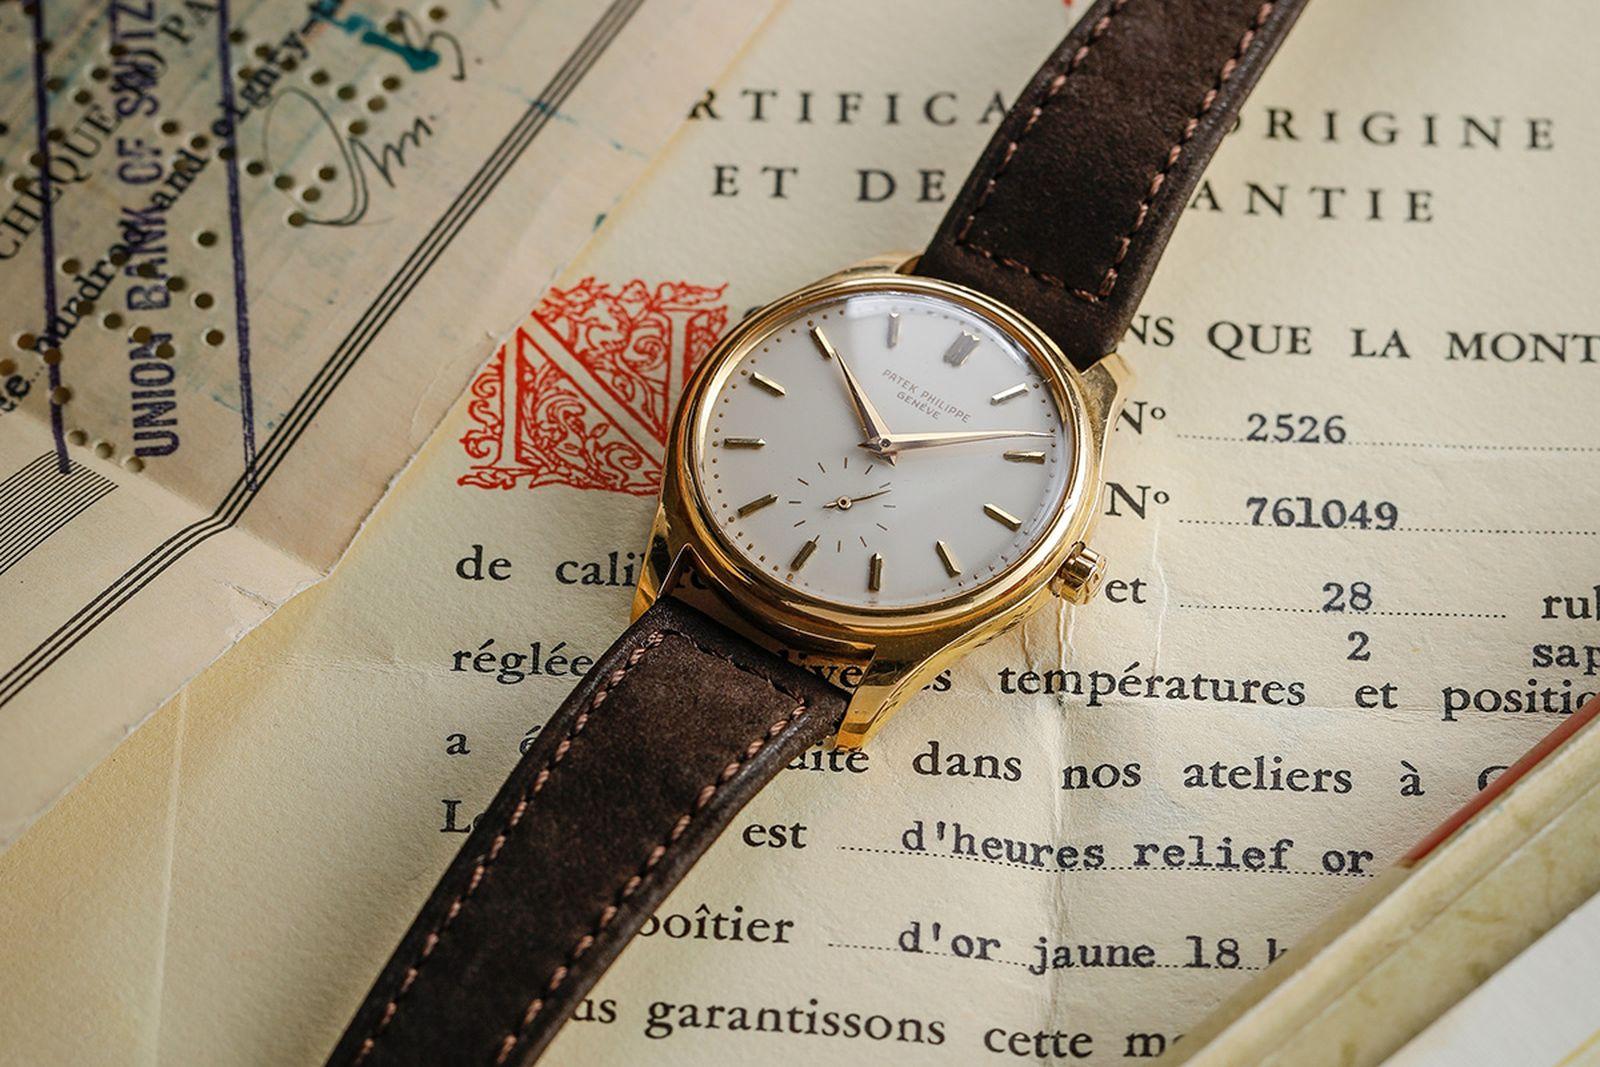 phillips-geneva-watch-auction-xiii-06